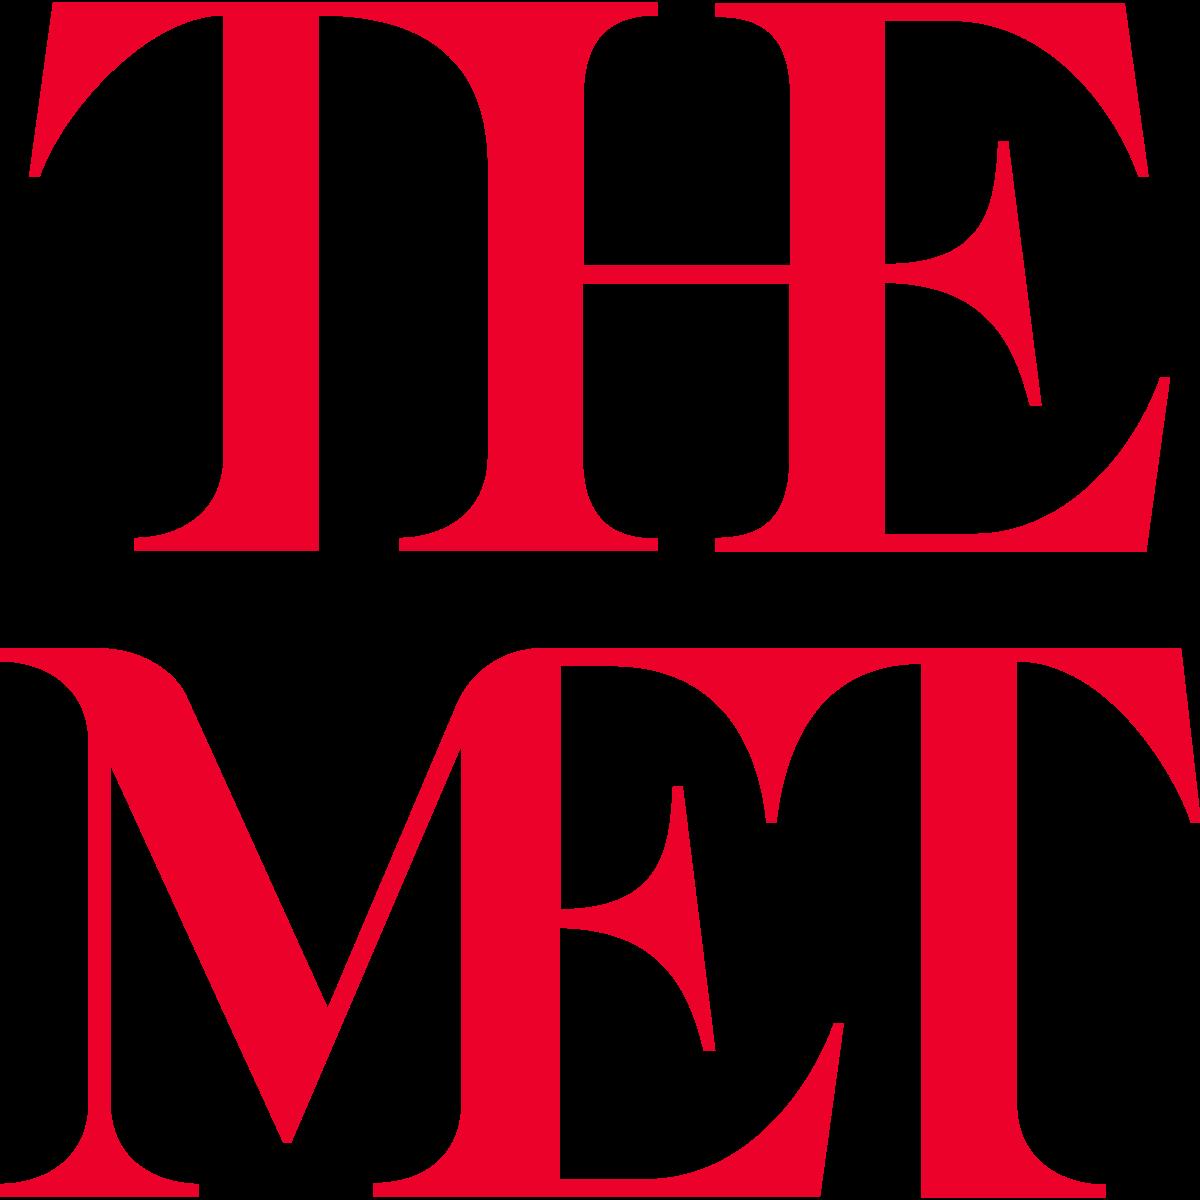 1200x1200 Metropolitan Museum Of Art